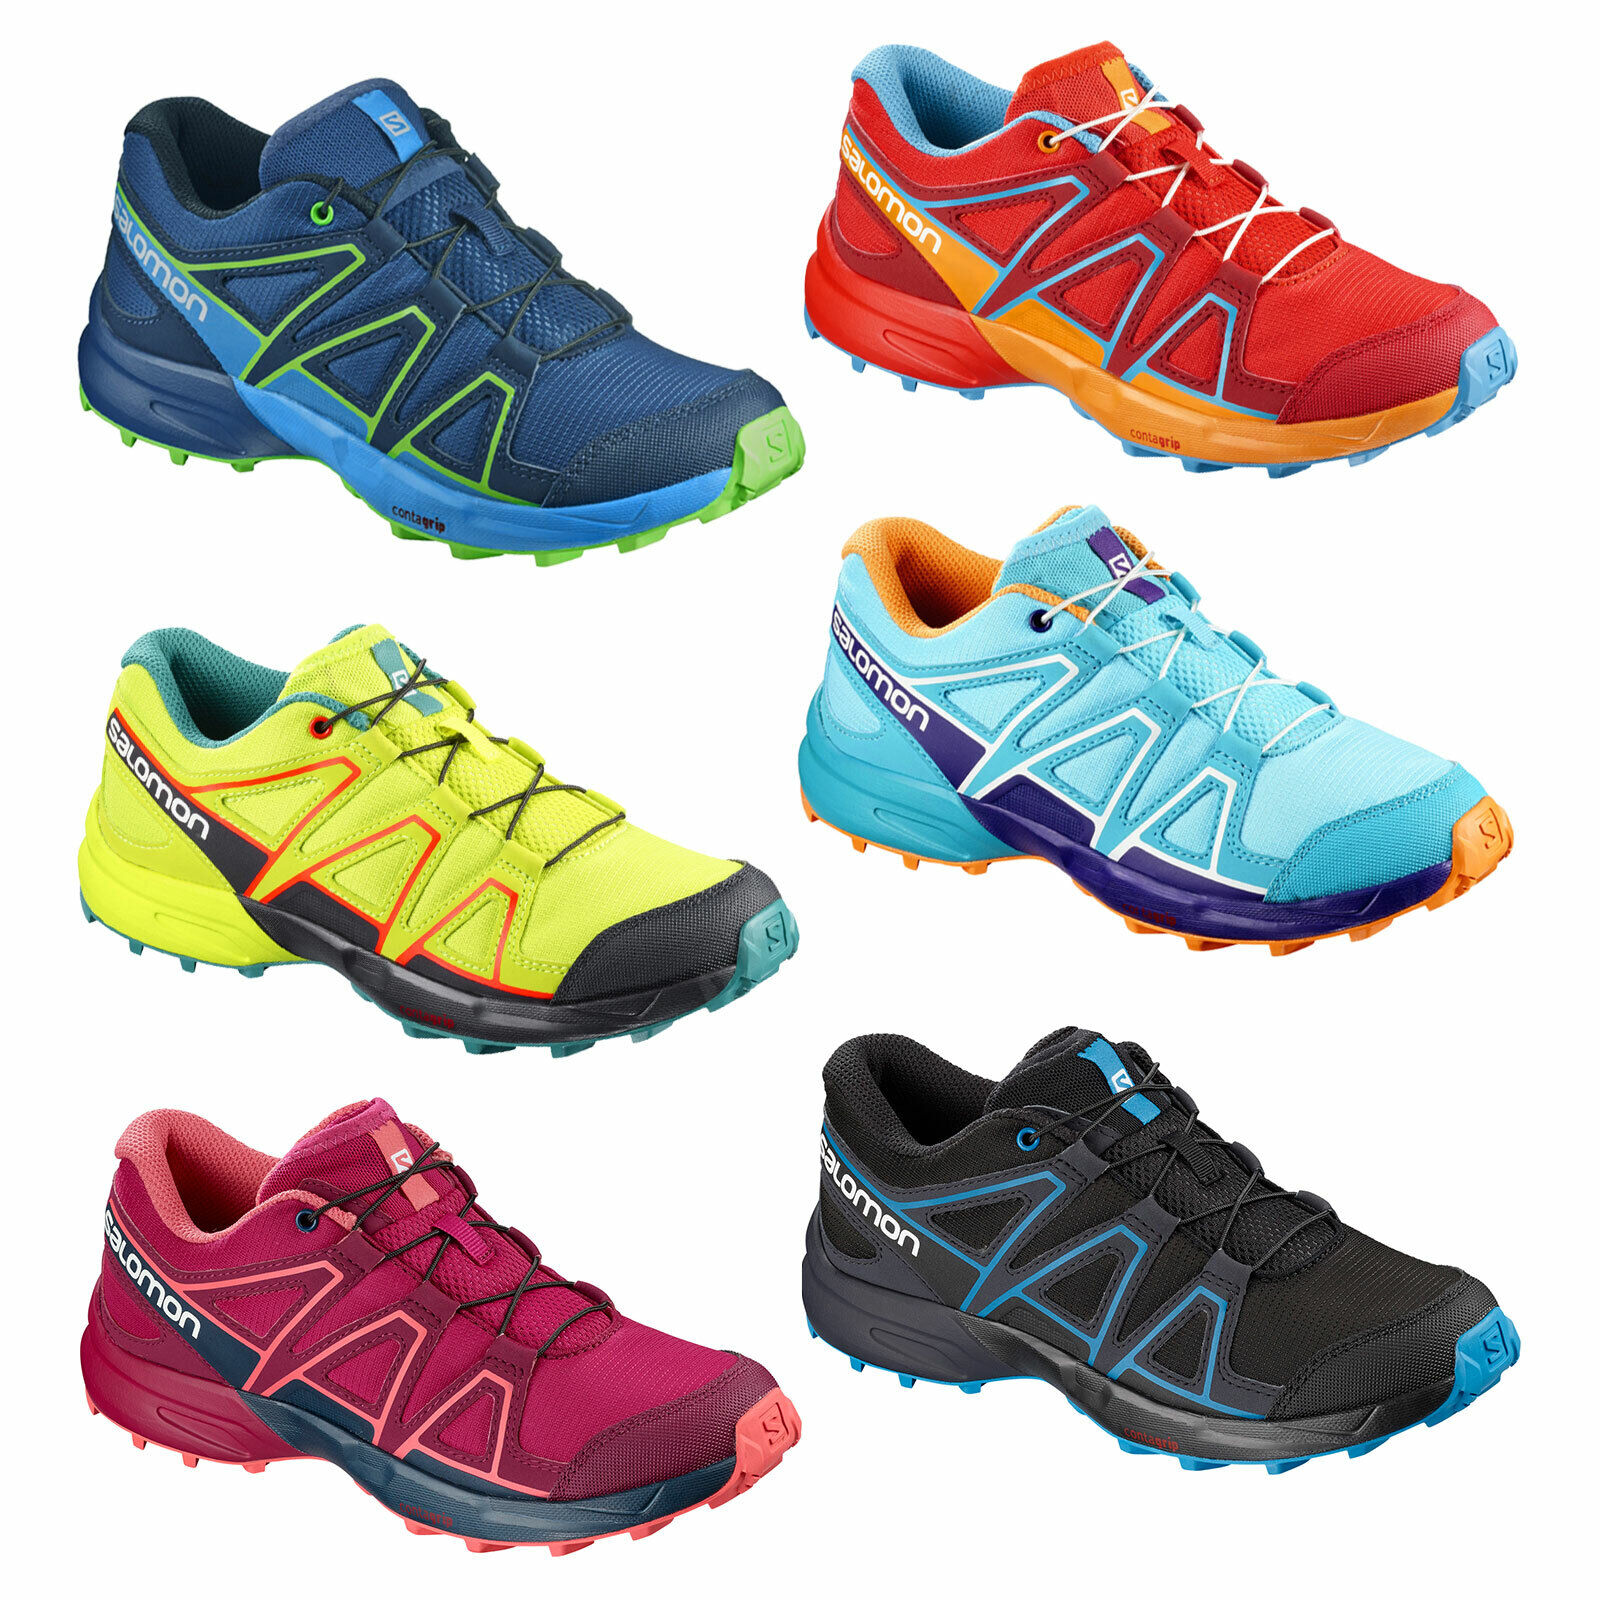 Salomon Gin J Junior Kids Running shoes hiking  shoes trekking footwear shoes  100% genuine counter guarantee